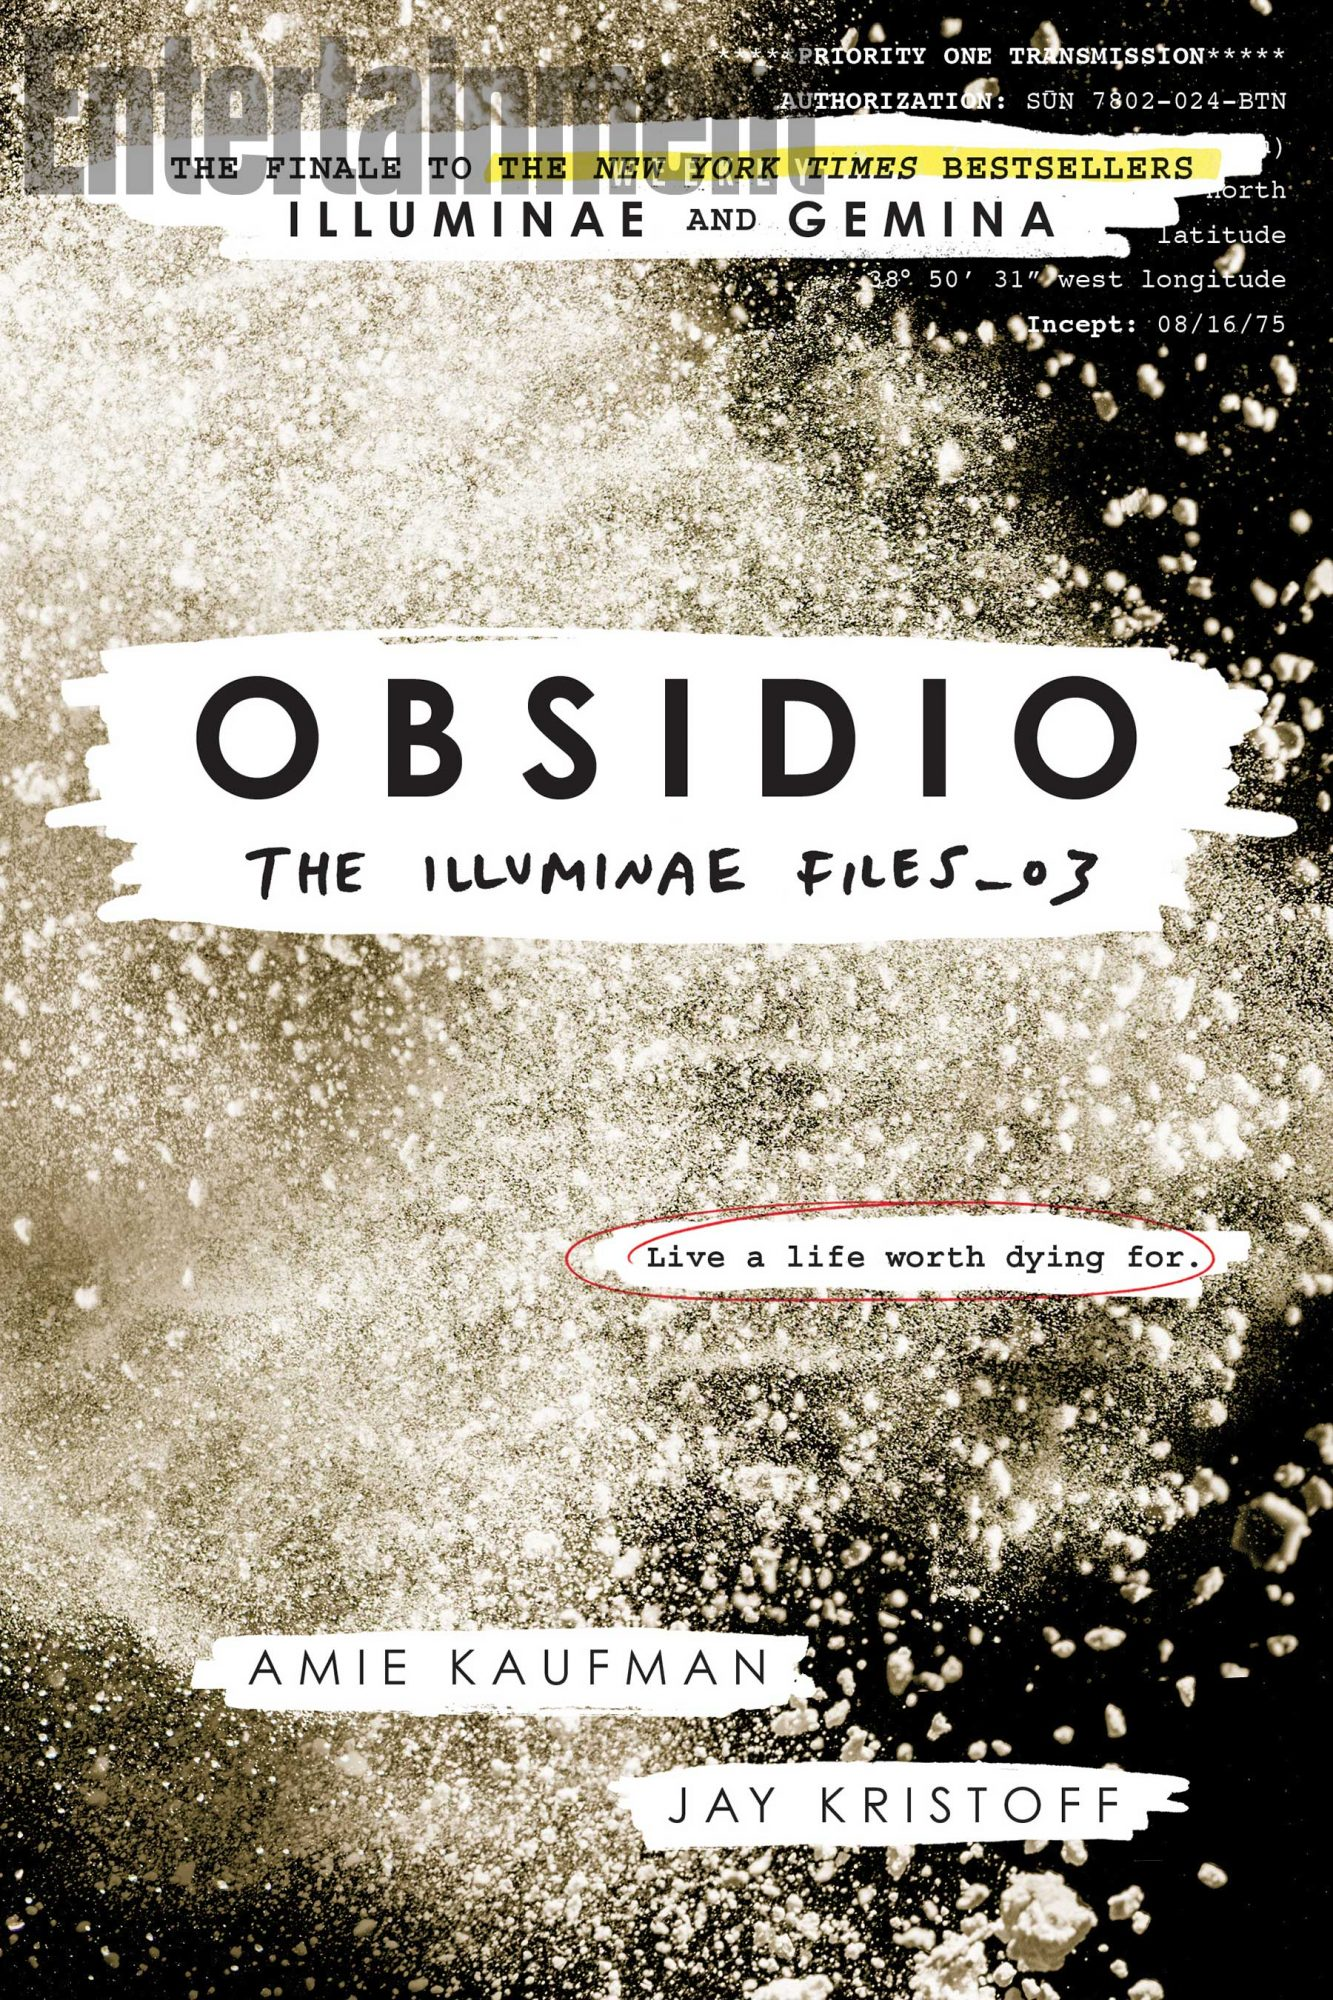 The Illuminae Files: Obsidio